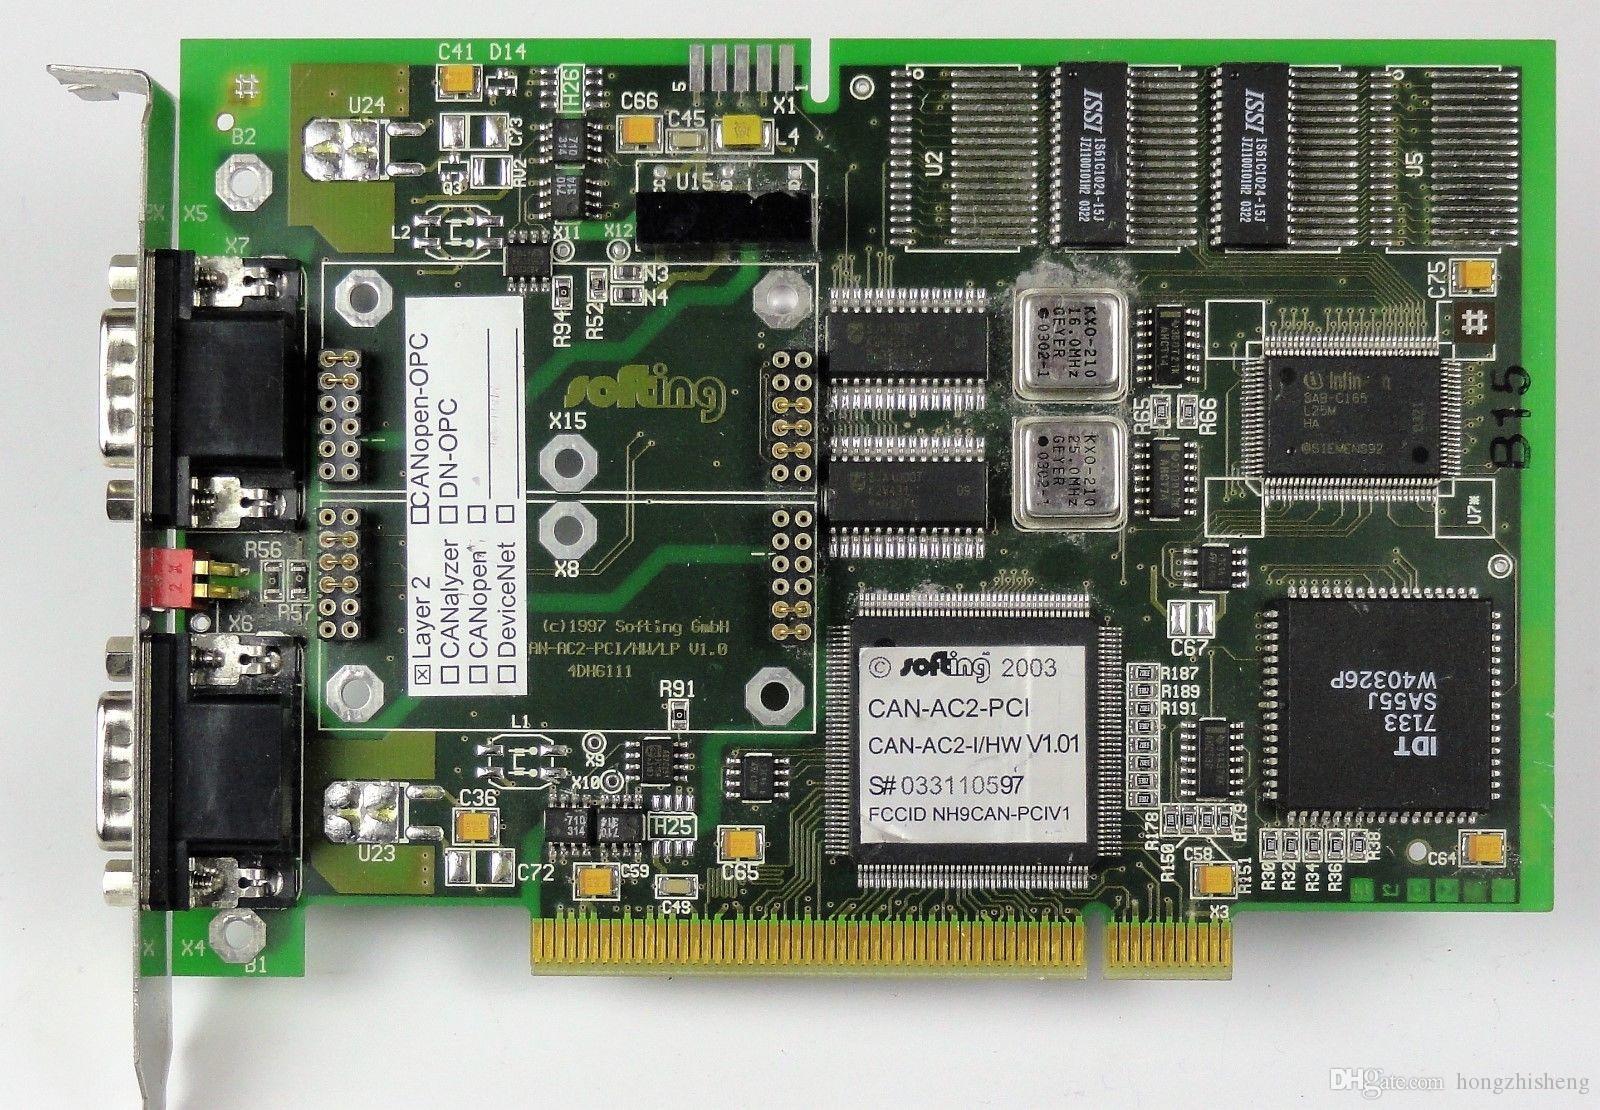 Placa de equipamento industrial SOTING GMBH CAN-AC2-PCI / HW / LP V.10 4DH6111 CAN-AC2-I / HW V1.01